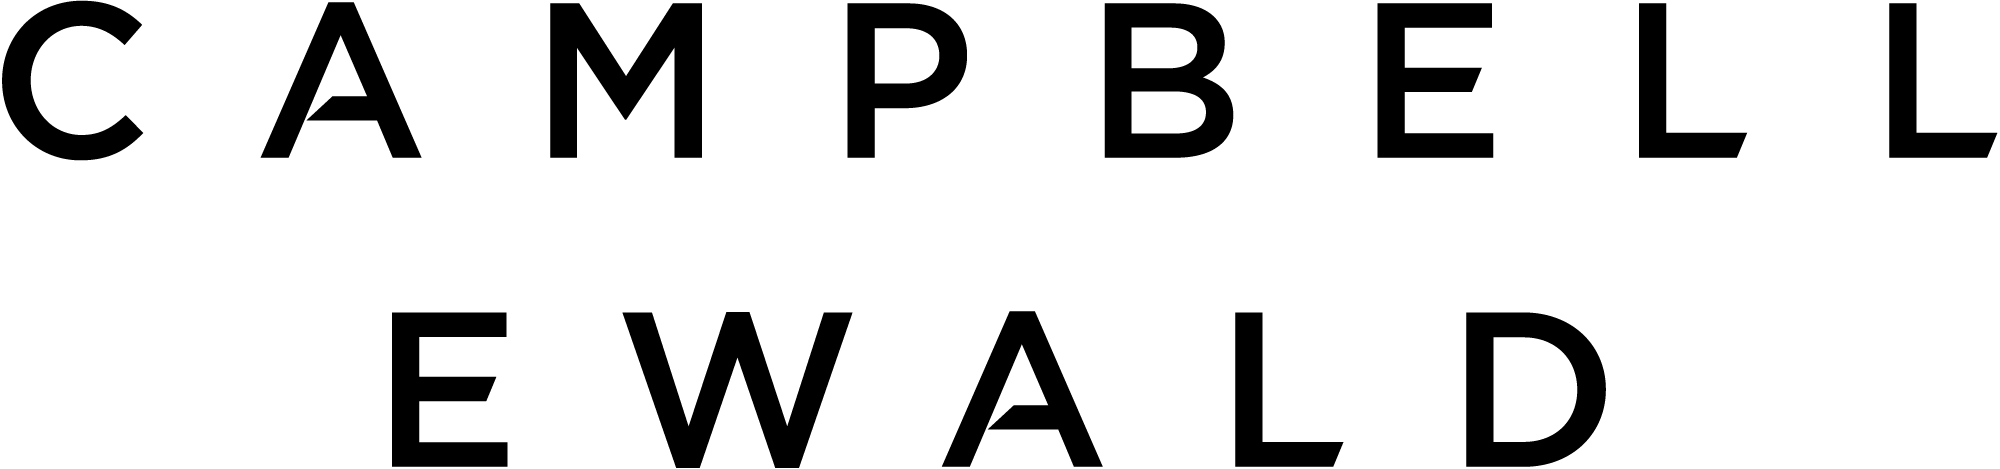 ce_logo_2015_black_centered_high.png